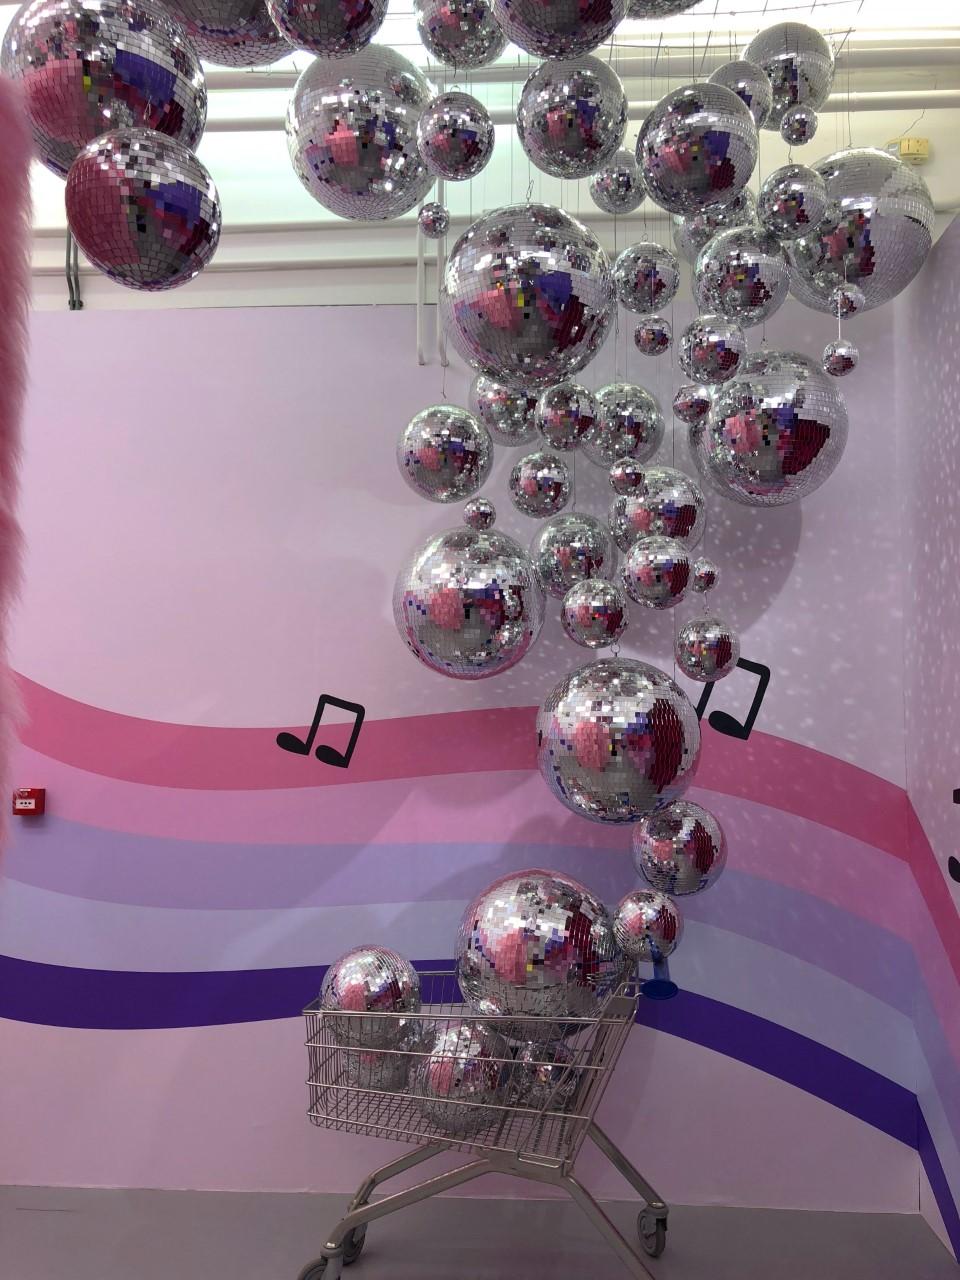 Pop-up museum WONDR: Instagram-walhalla of speeltuin voor volwassene?